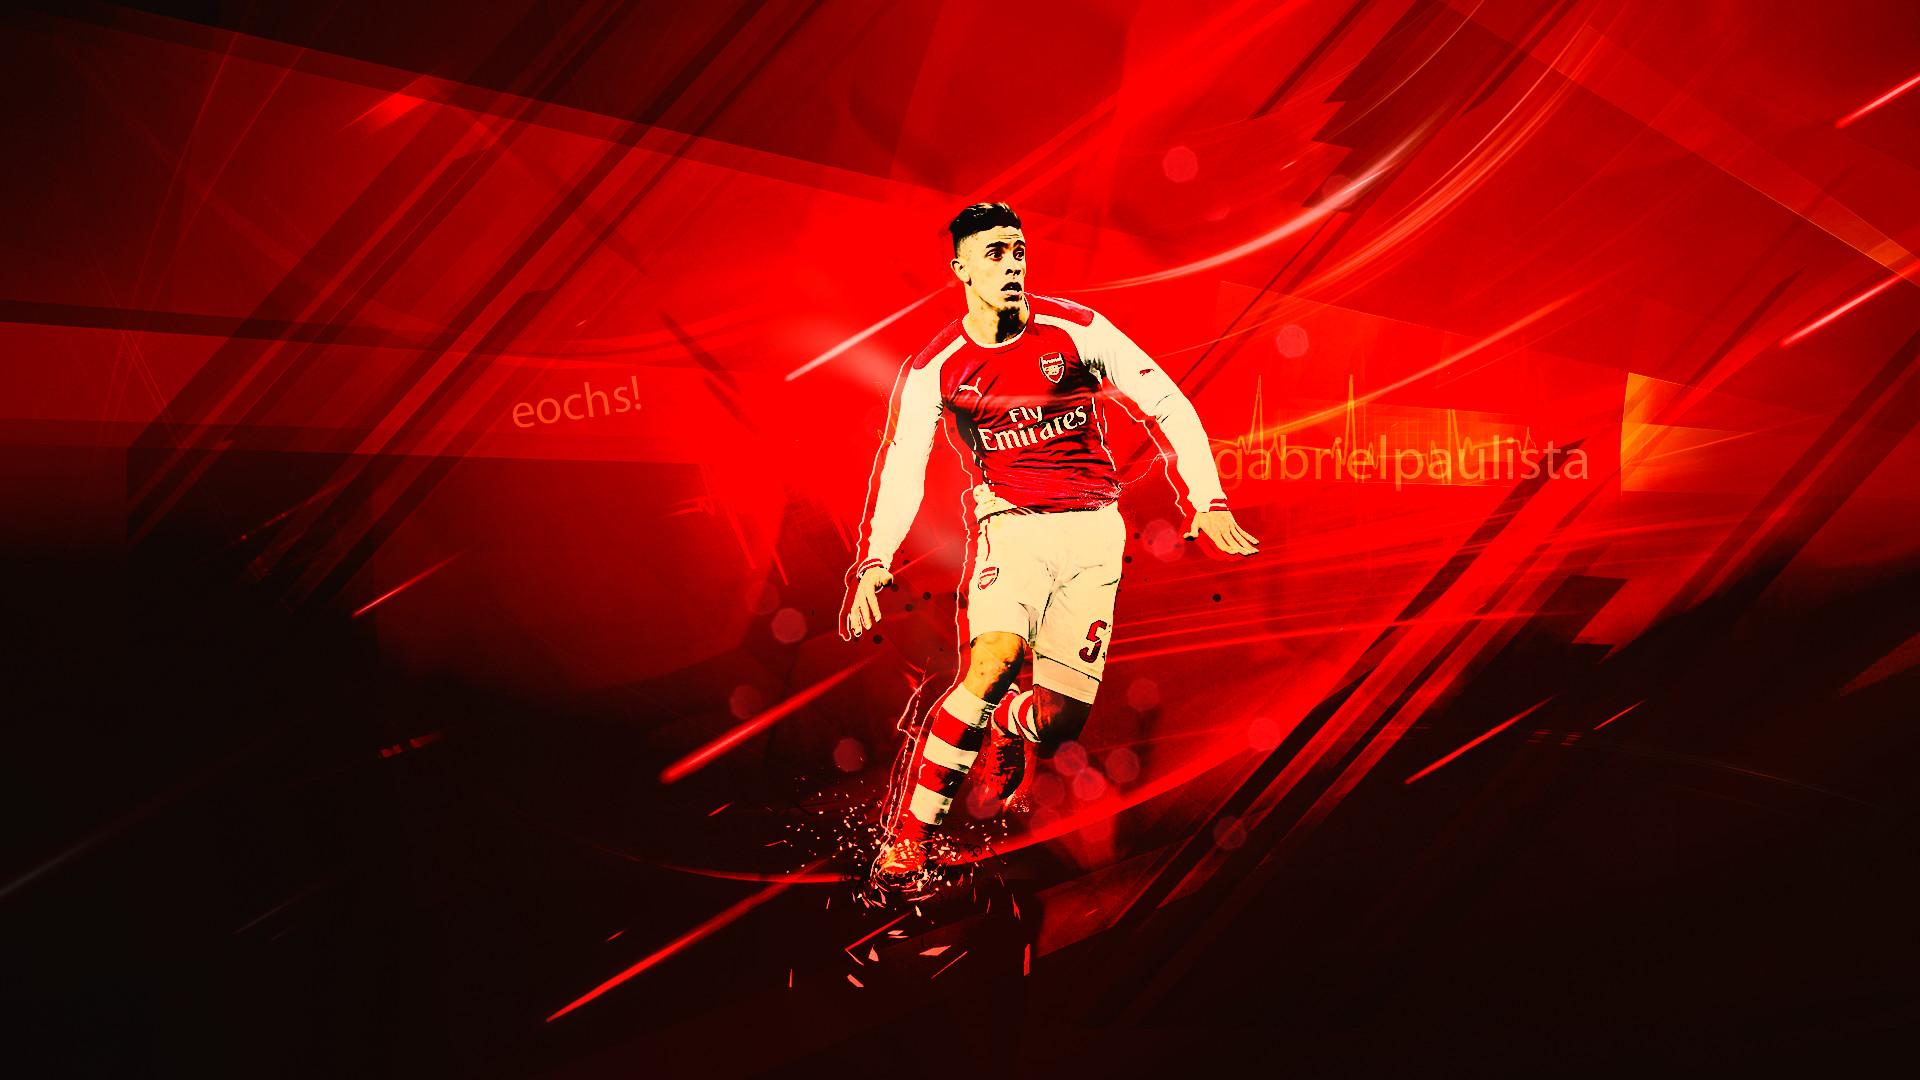 Mesut Ozil Wallpapers Hd Arsenal Arsenal Wallpaper 2018 86 Images